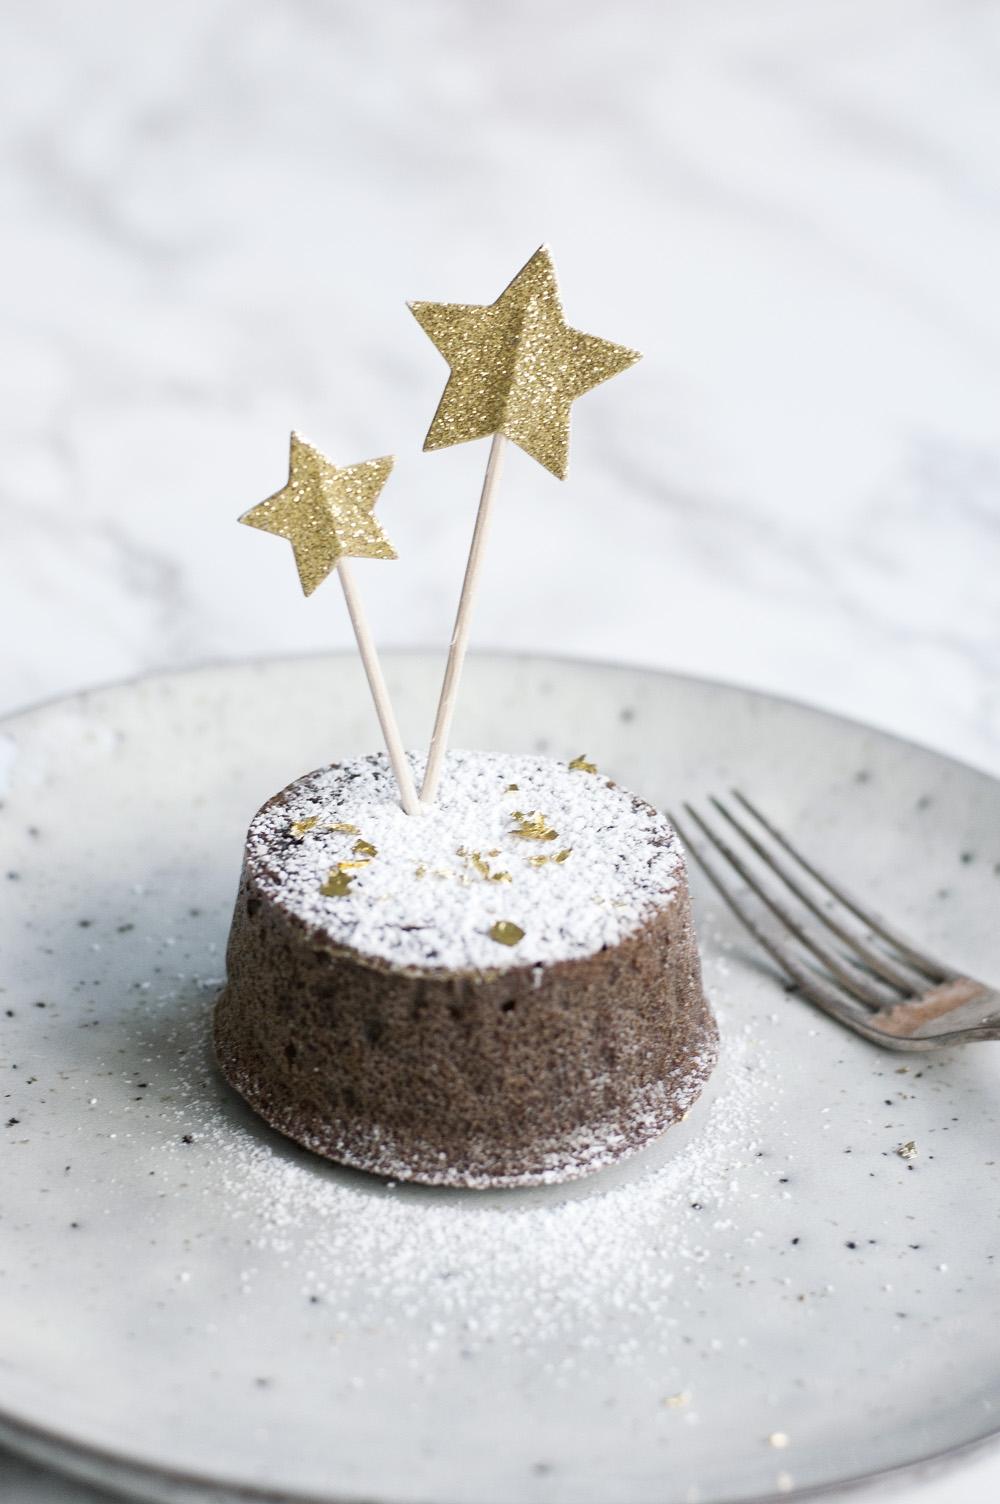 Copenhagen Cakes Copenhagencakes Chokoladefondant Chocolate Fondant New Years Dessert Nytaarsaften 2